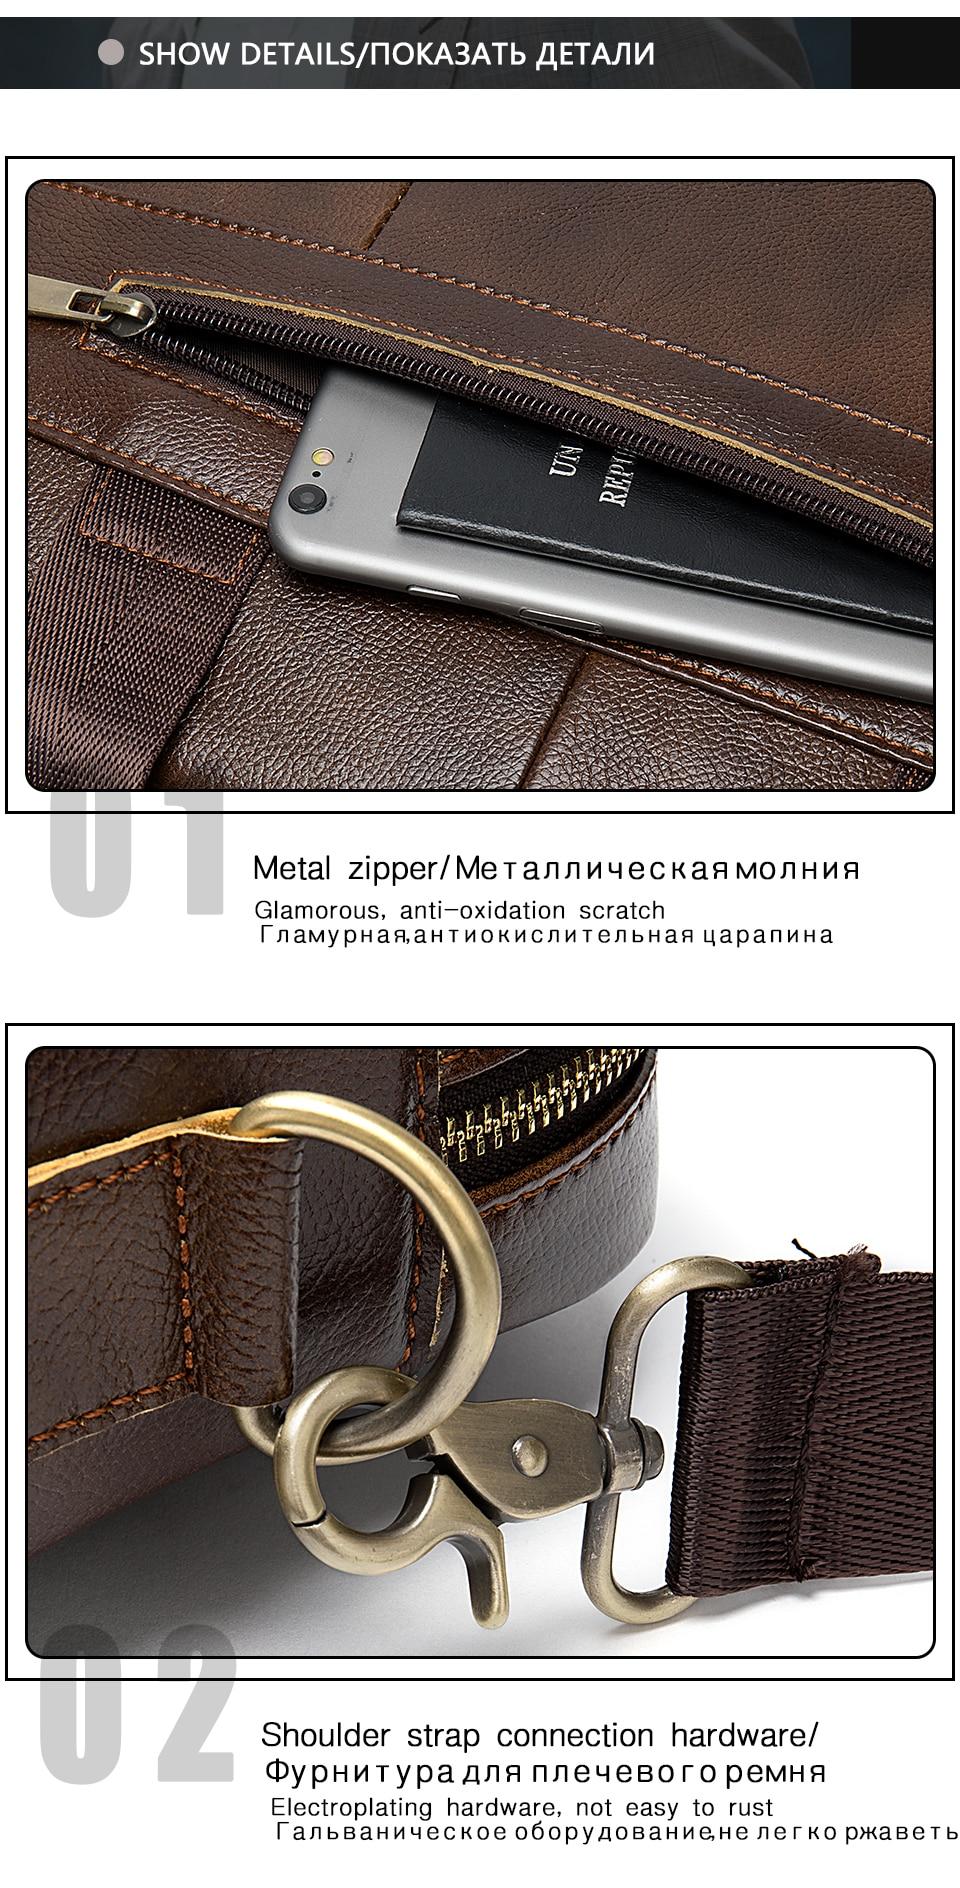 HTB1Q33zaV67gK0jSZPfq6yhhFXa5 WESTAL Bag men's Genuine Leather briefcase Male man laptop bag natural Leather for men Messenger bags men's briefcases 2019